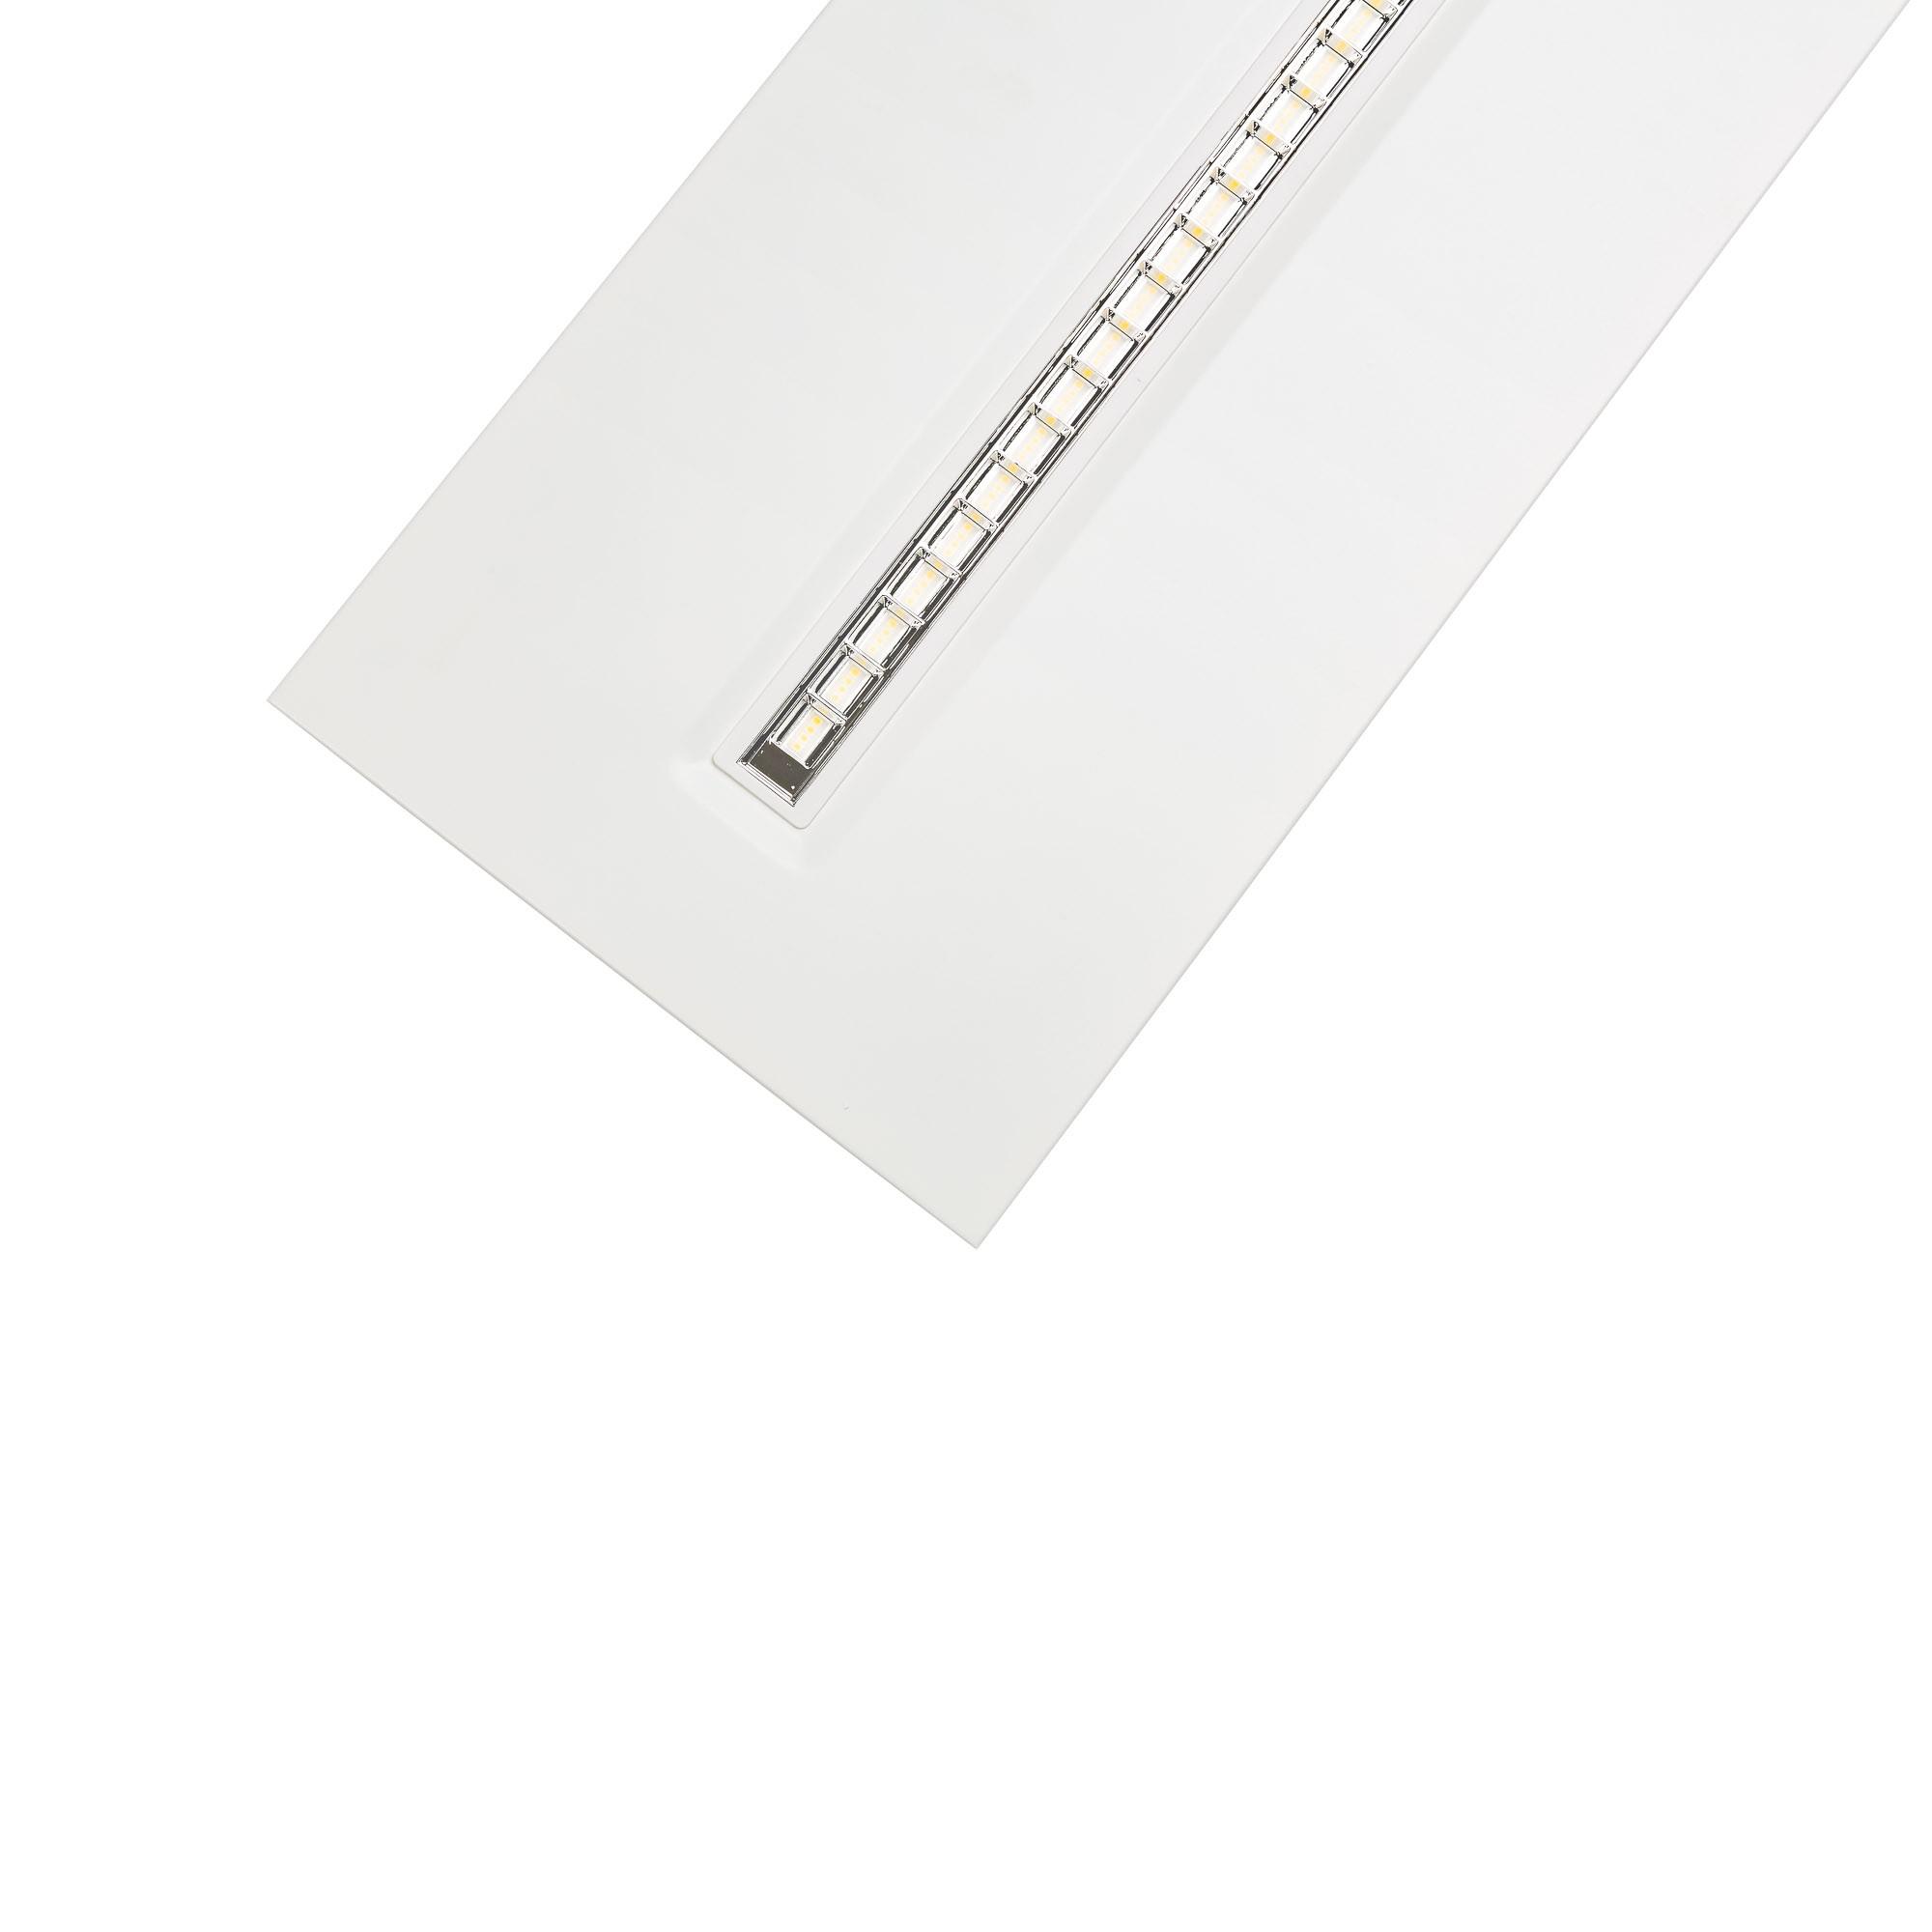 UGR<16 - LOW GLARE LED PANEL - 30W - 1200mm X 300mm - 4000K